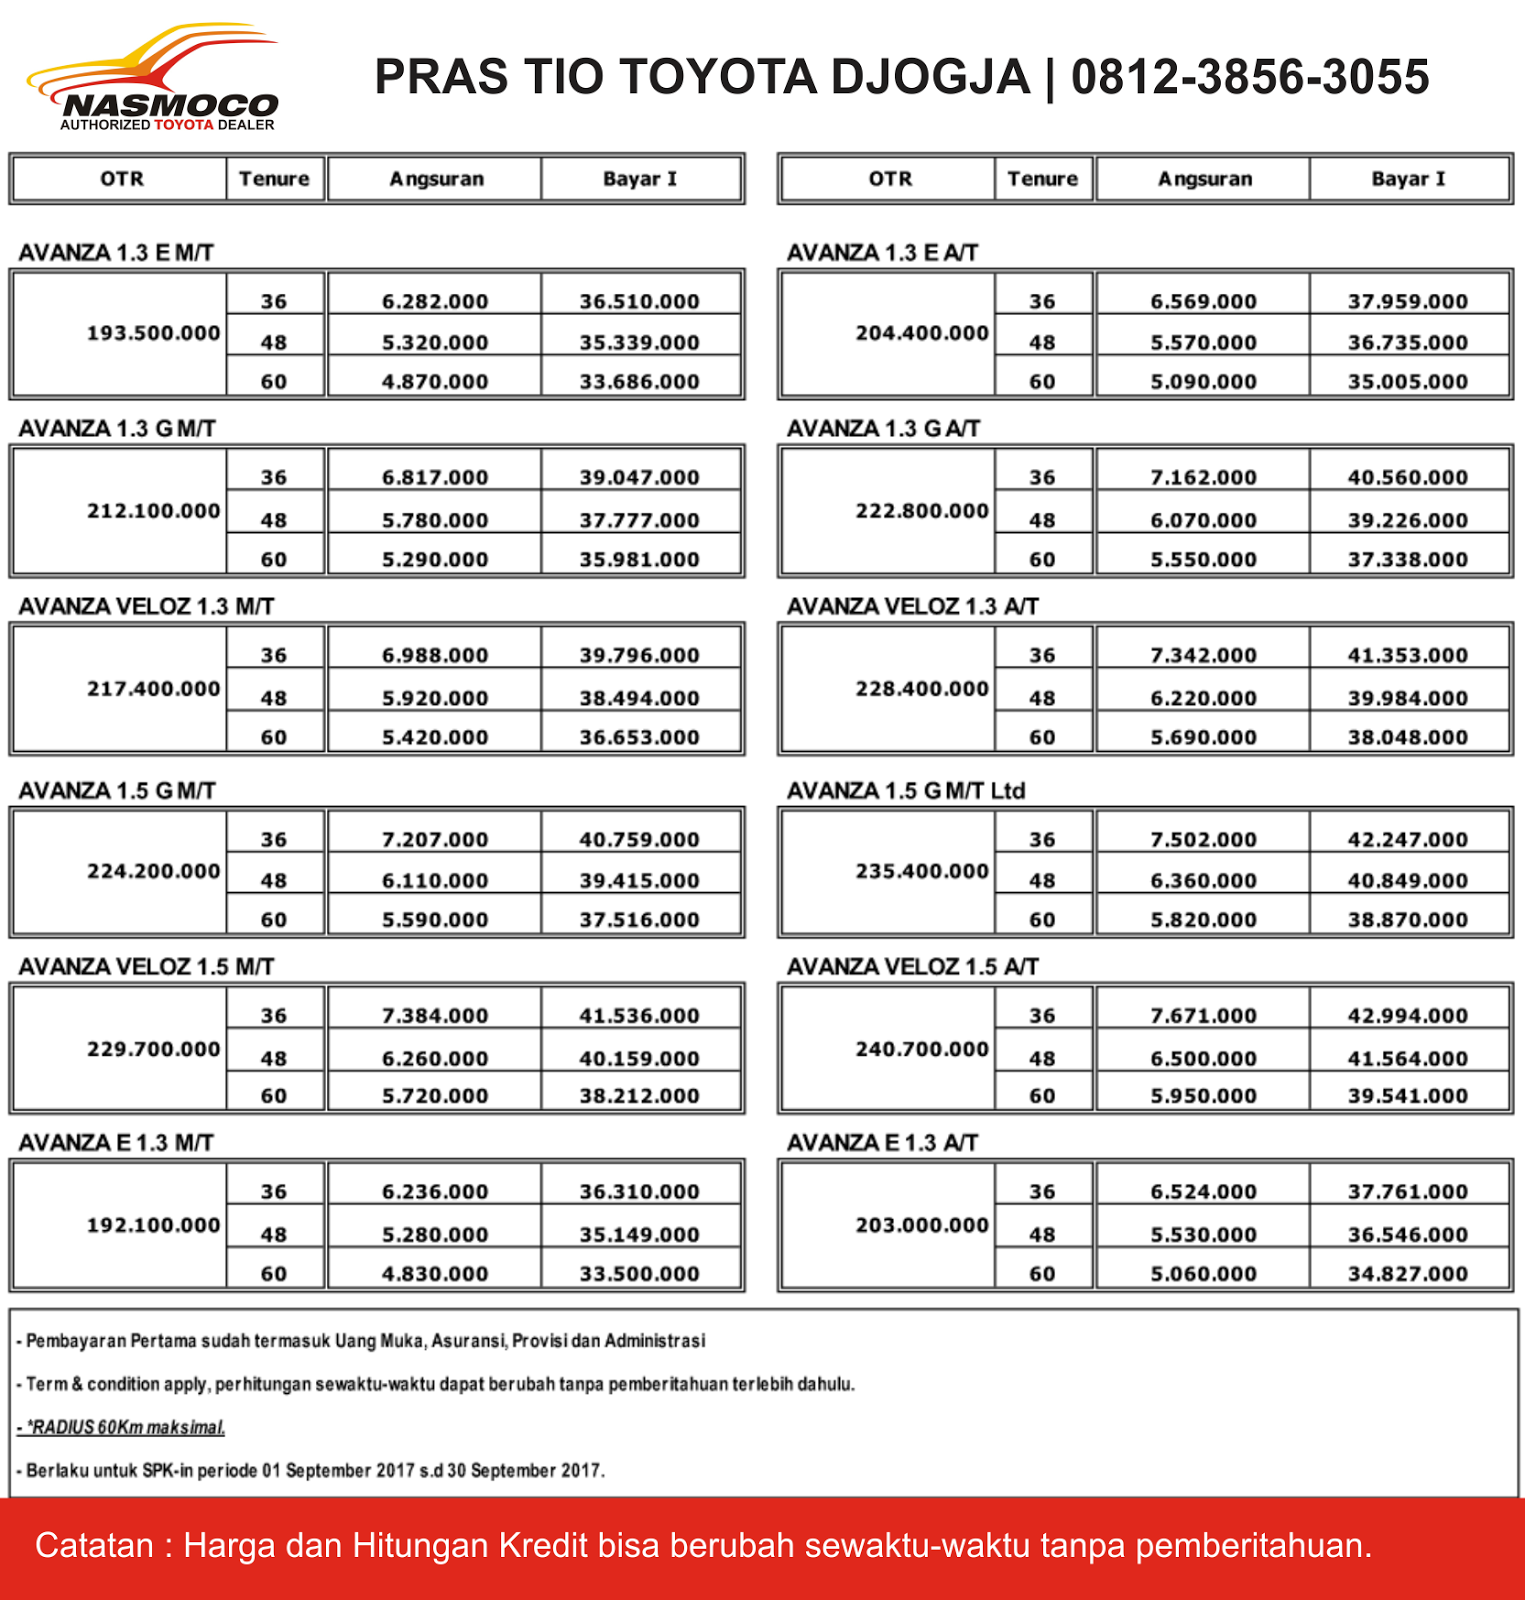 Grand New Avanza Yogyakarta Veloz Vs Ertiga Promo Kredit Termurah Jogja Jateng Dealer Toyota